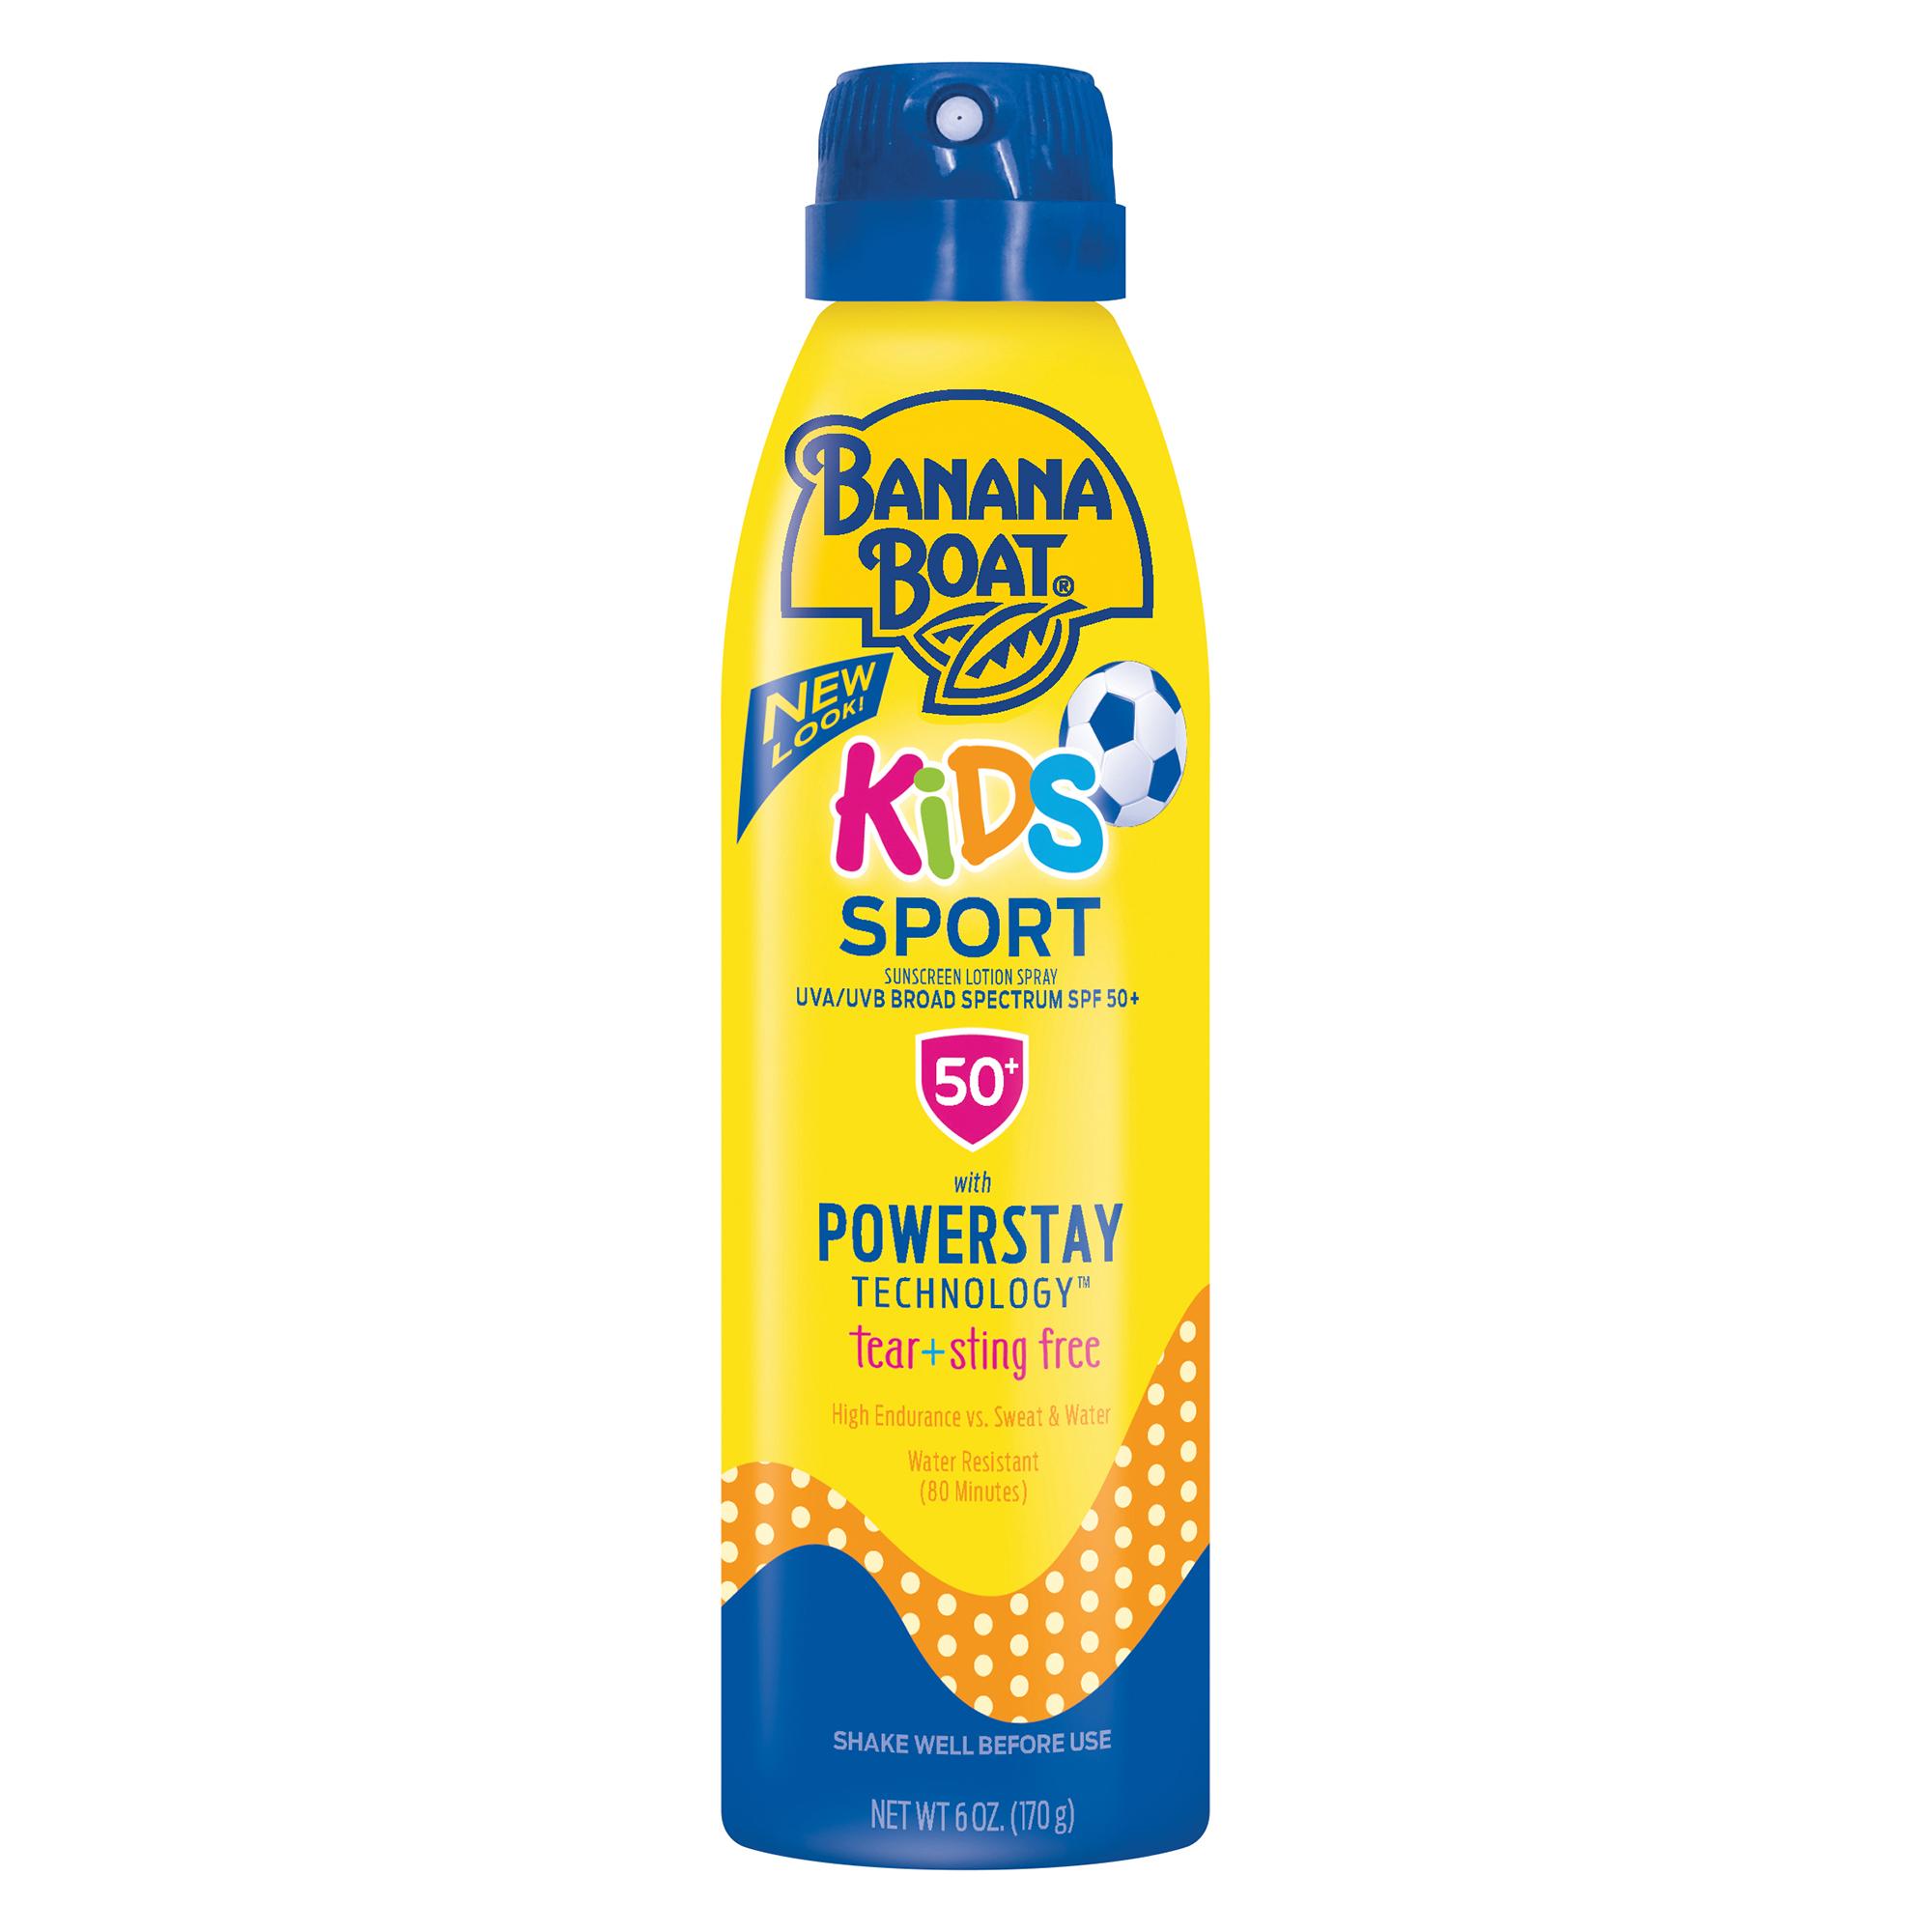 Banana Boat Kids Sport Sunscreen Lotion Spray SPF 50+, 6 Oz, Packaging May Vary